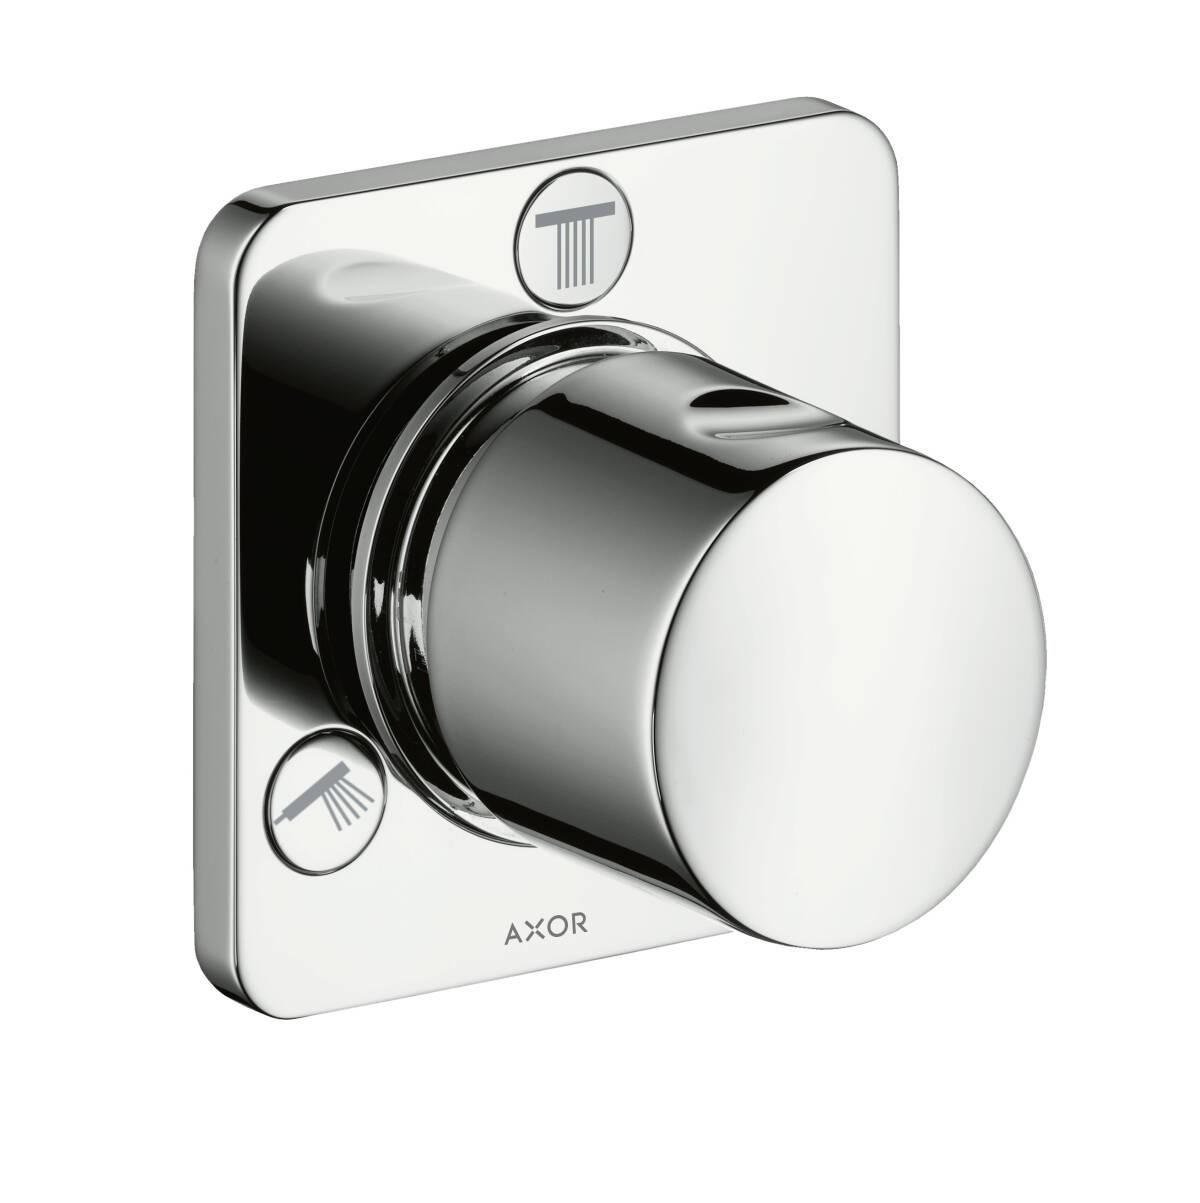 Shut-off/ diverter valve Trio/ Quattro for concealed installation, Chrome, 34920000